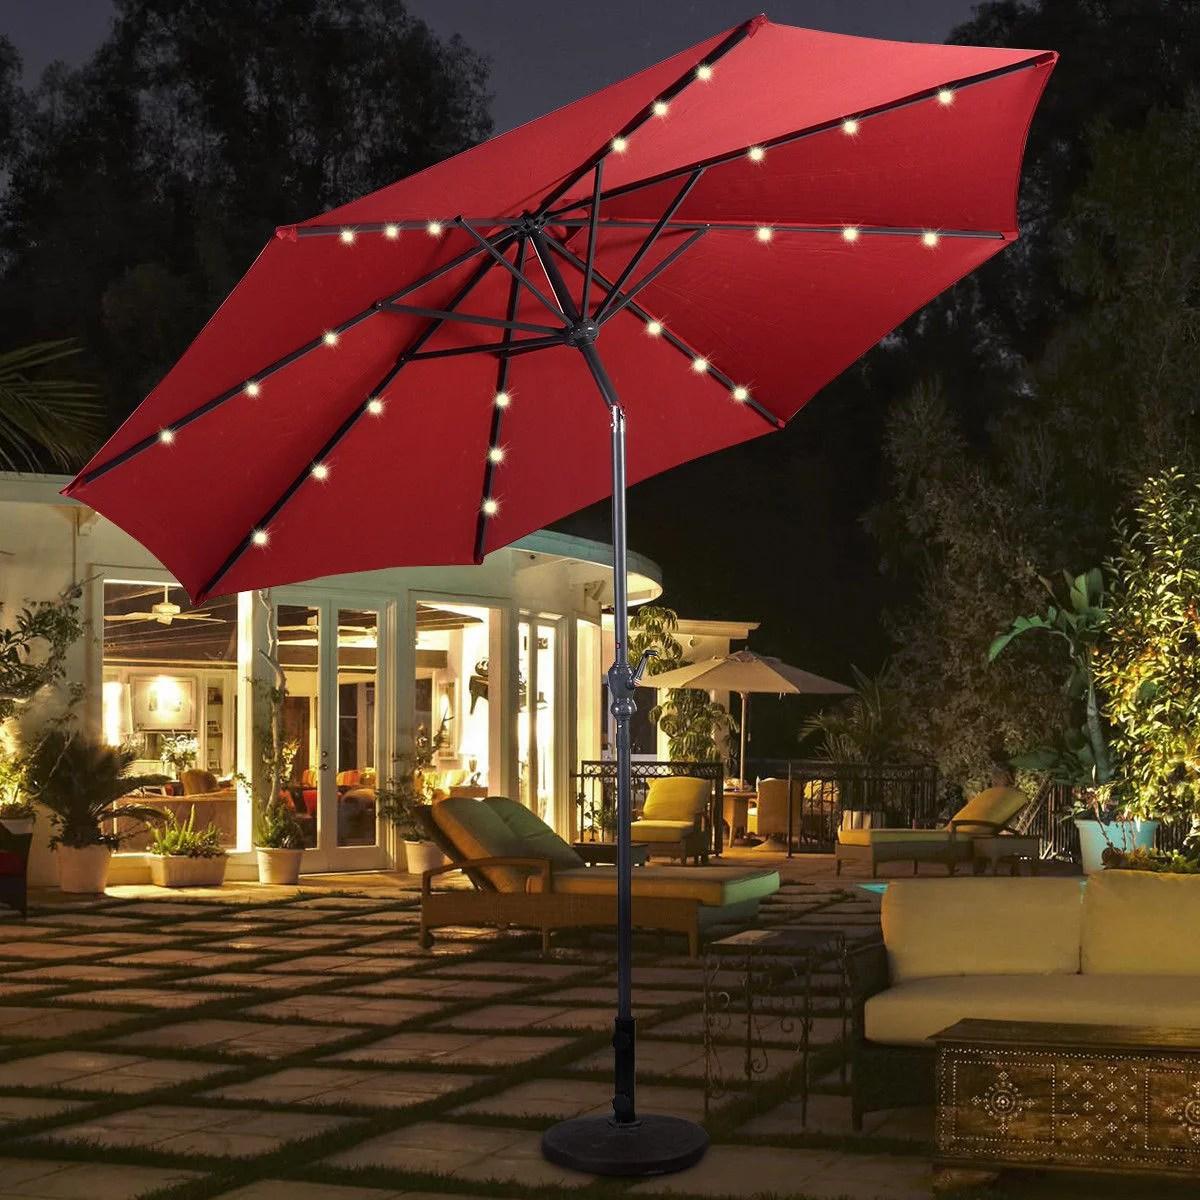 costway 10ft patio solar umbrella led patio market steel tilt w crank burgundy walmart com